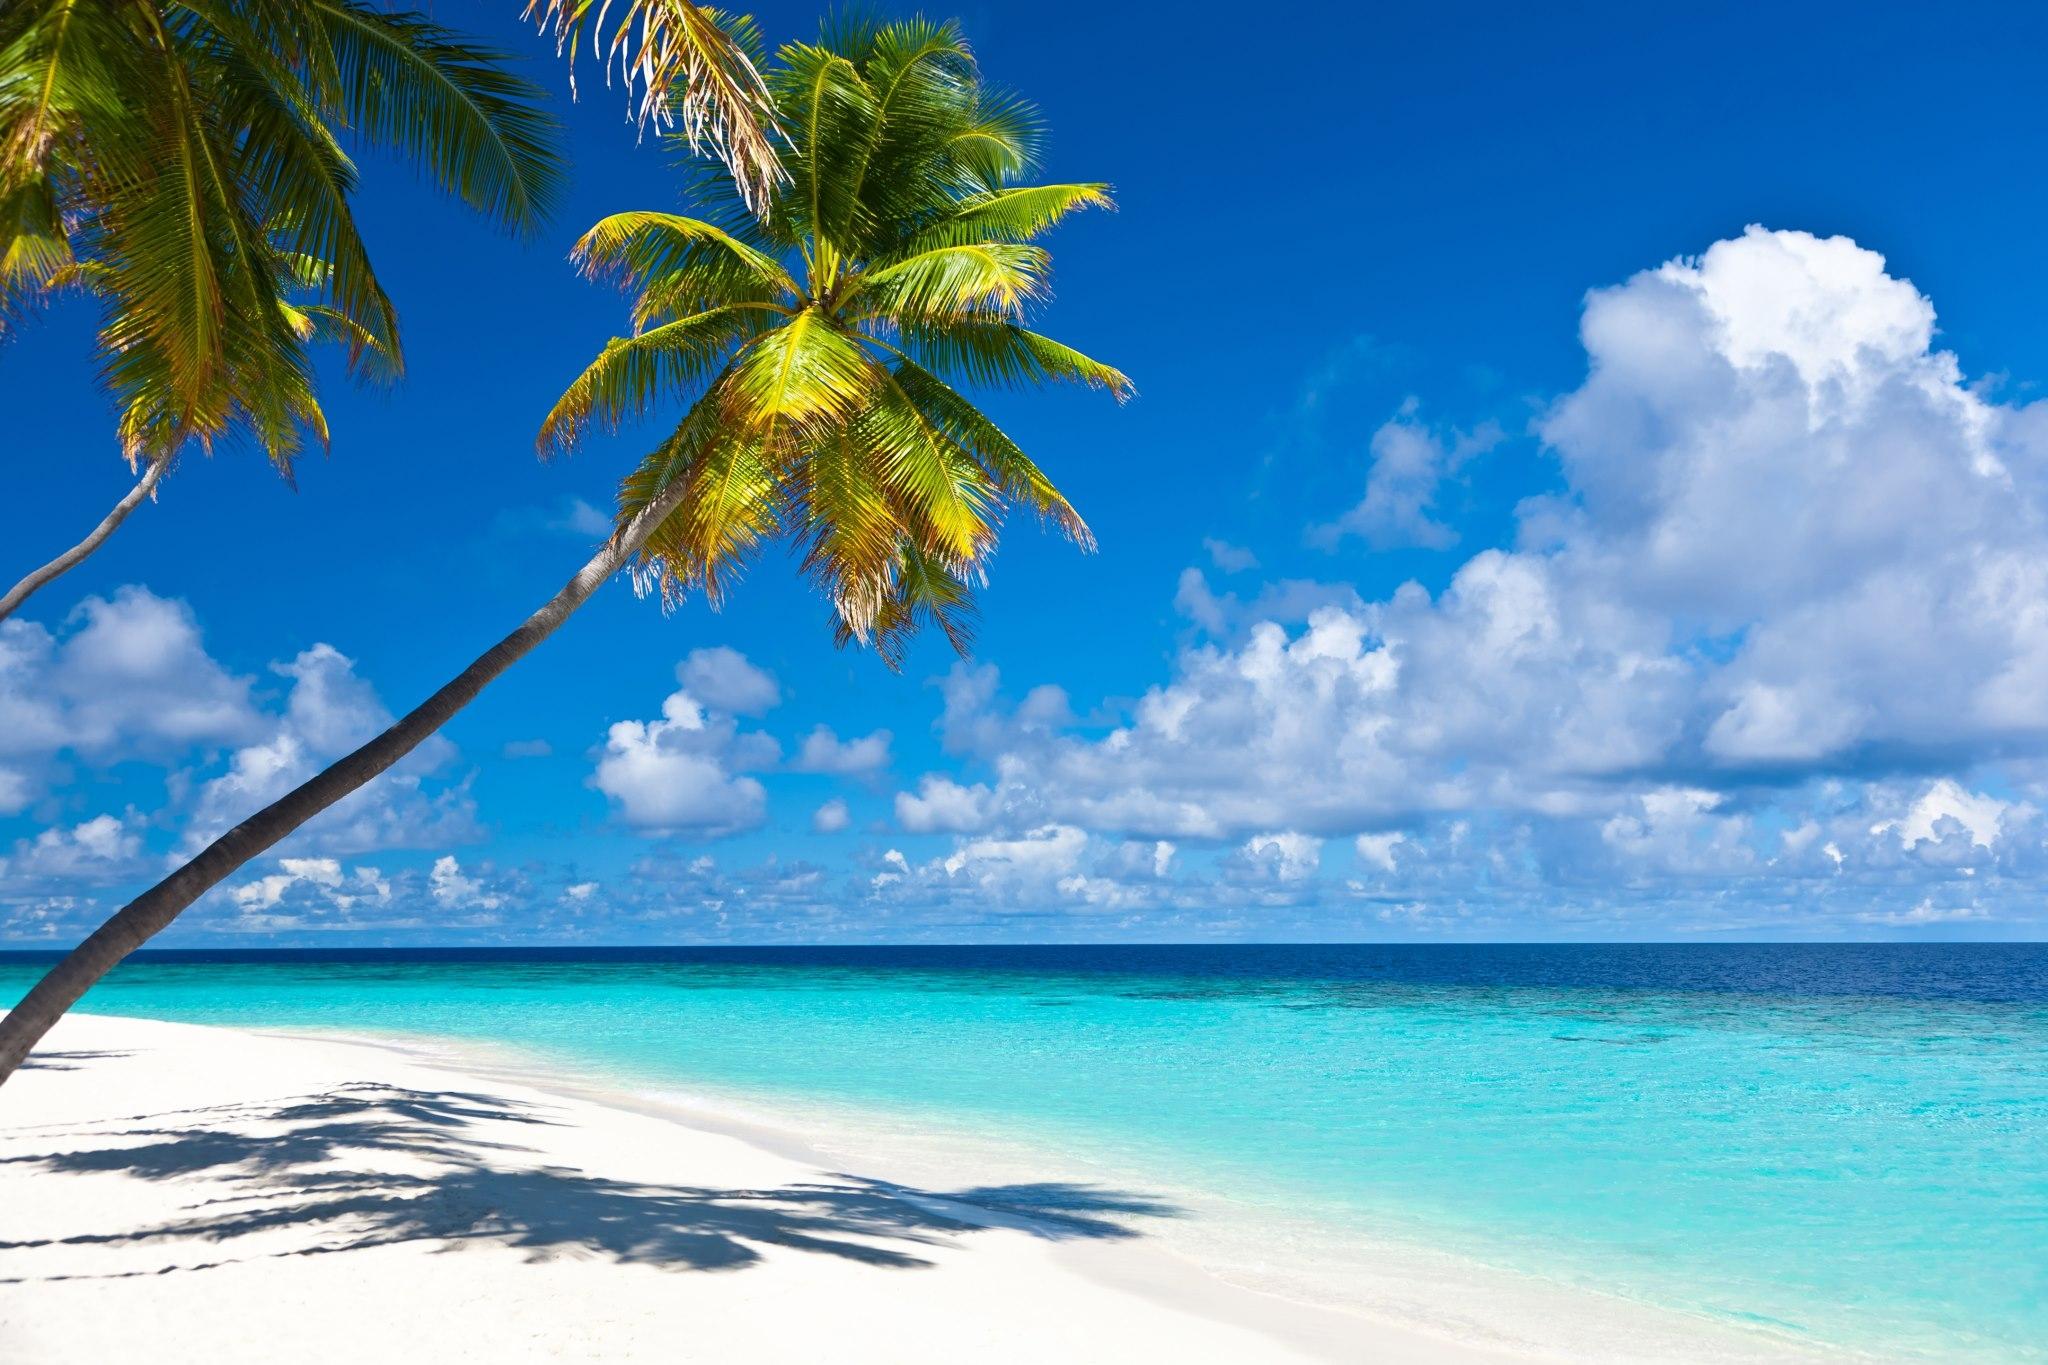 Caribbean Beaches Islands: Happy Vacations